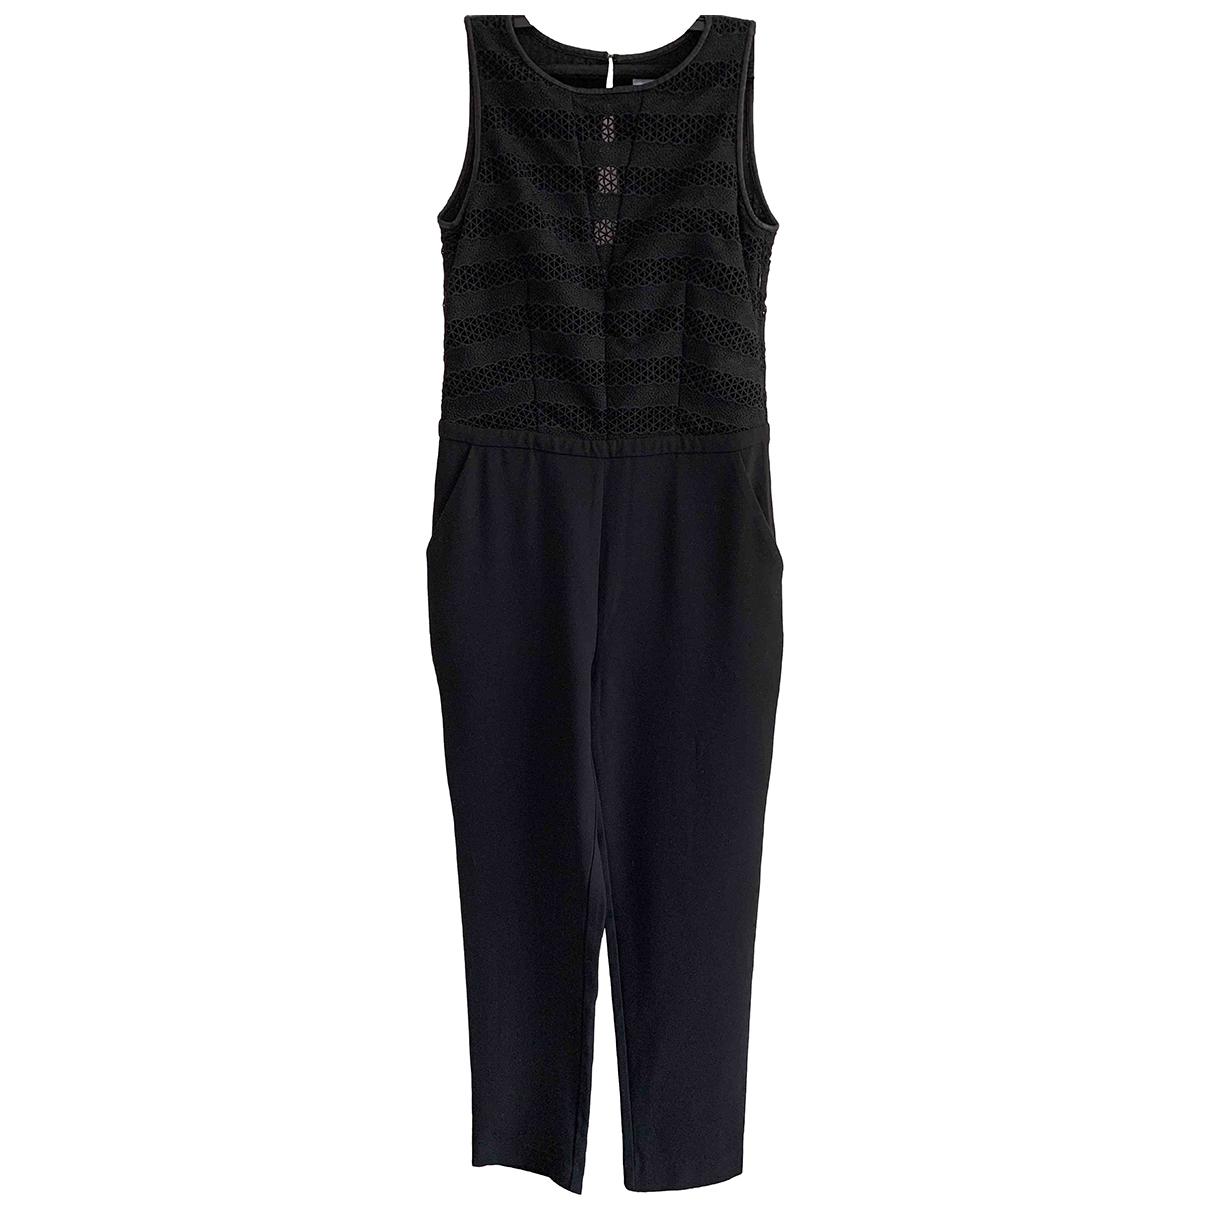 Suncoo \N Black jumpsuit for Women 40 IT